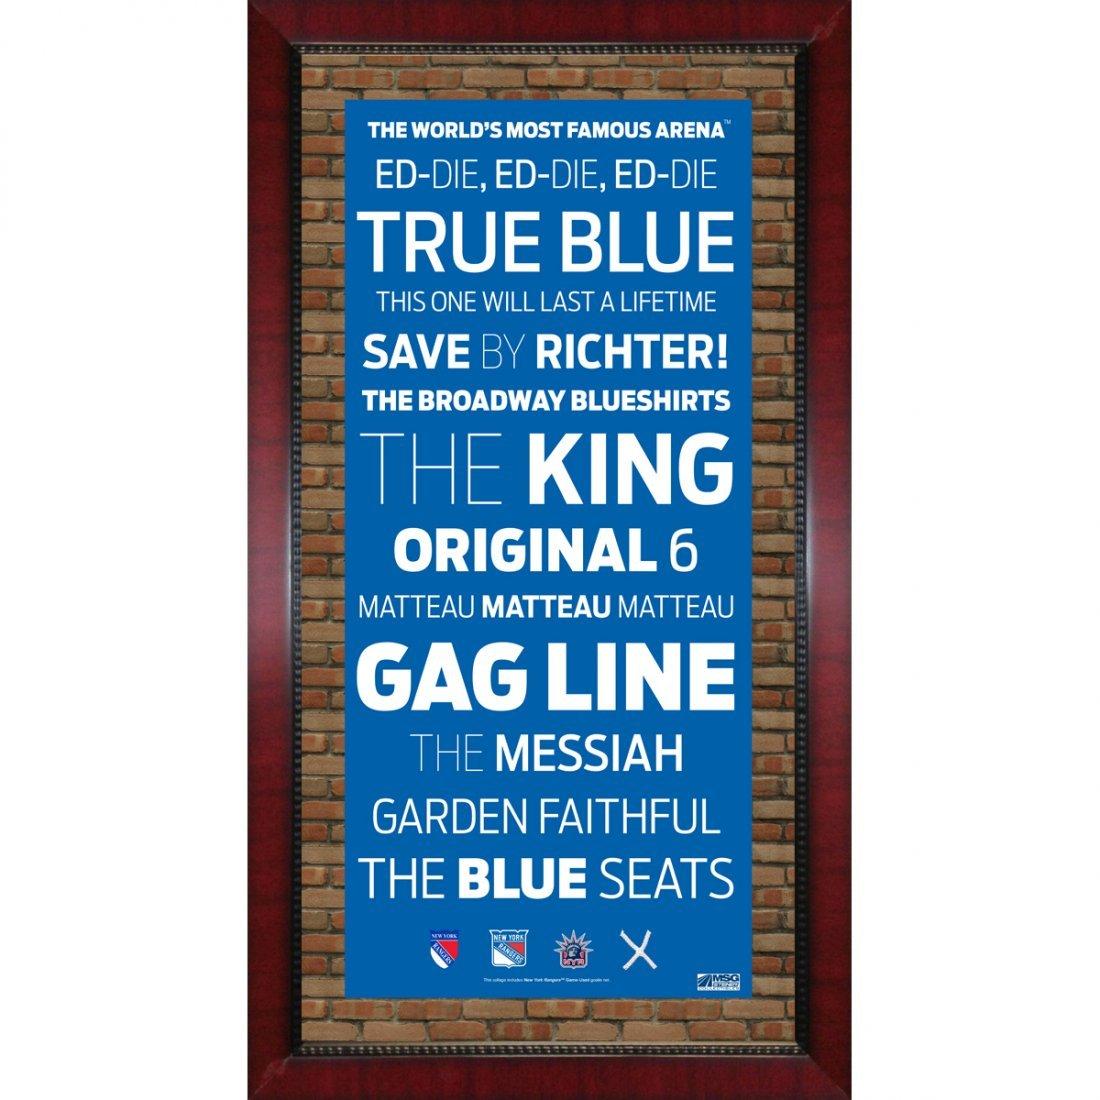 New York Rangers Subway Sign Framed 16x32 Photo w/Game